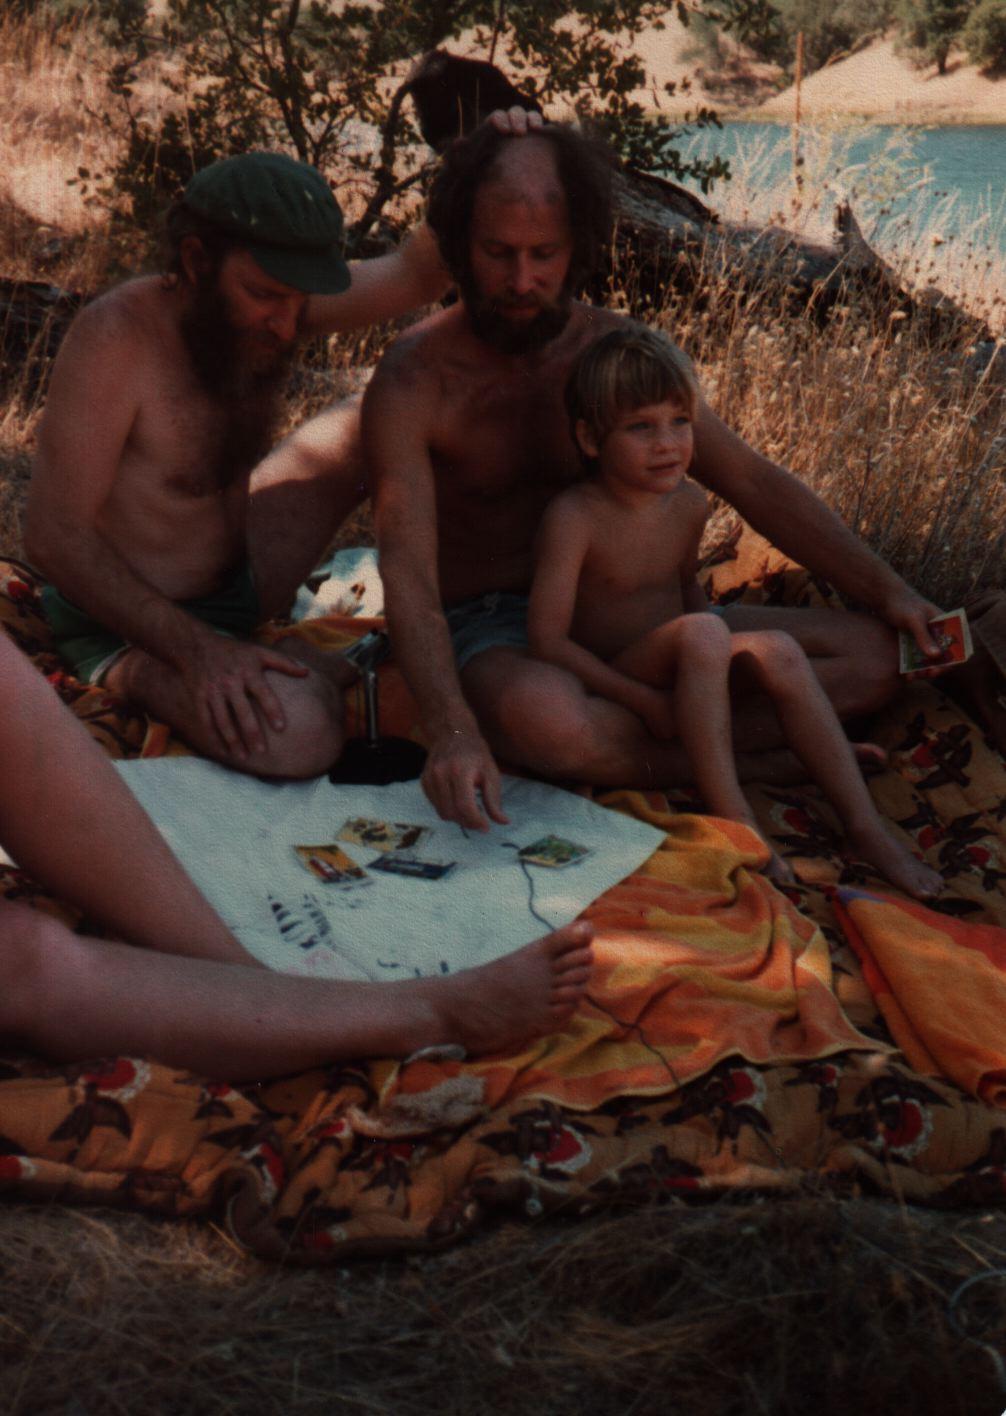 81 Joys  Ezra Berg with Aaron and Jeremiah Greenberg, Tarot cards near the lake copy.jpg